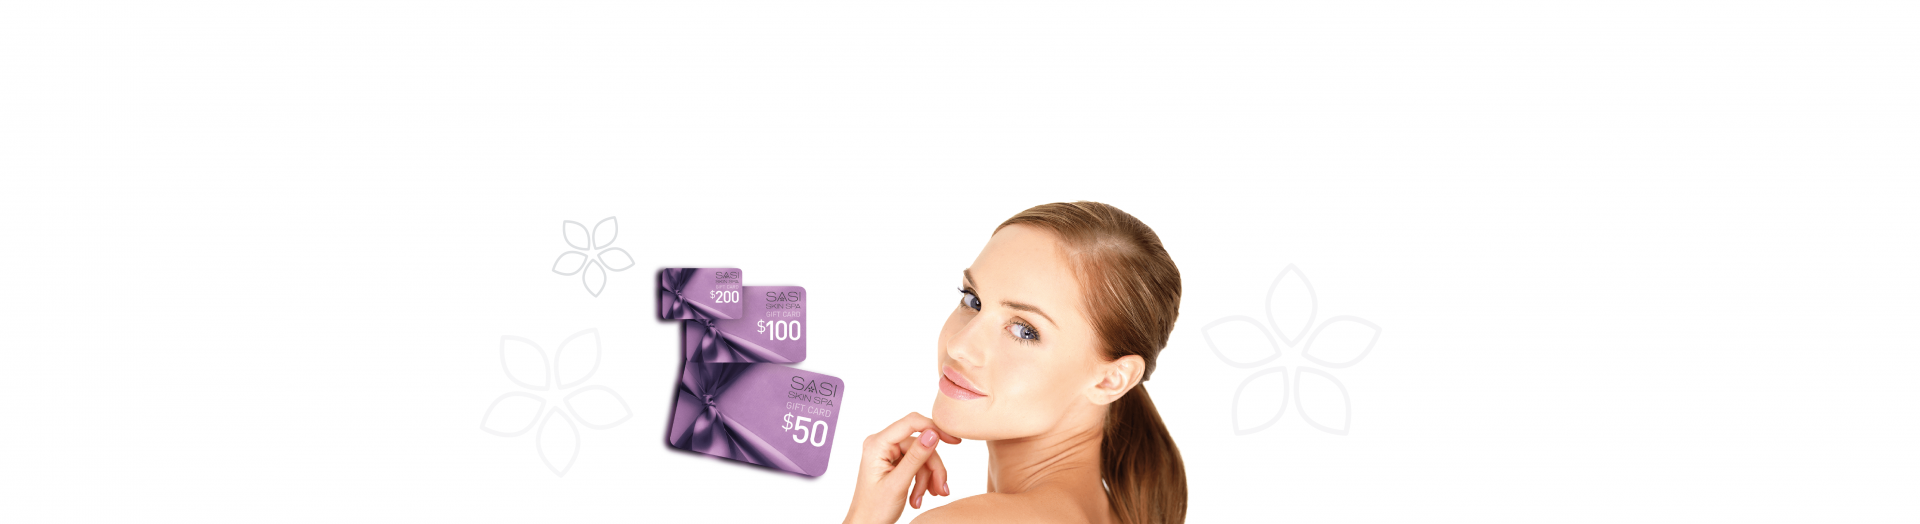 Sasi Skin Spa Sasi-Vouchers-Hero-e1592260658892 Vouchers